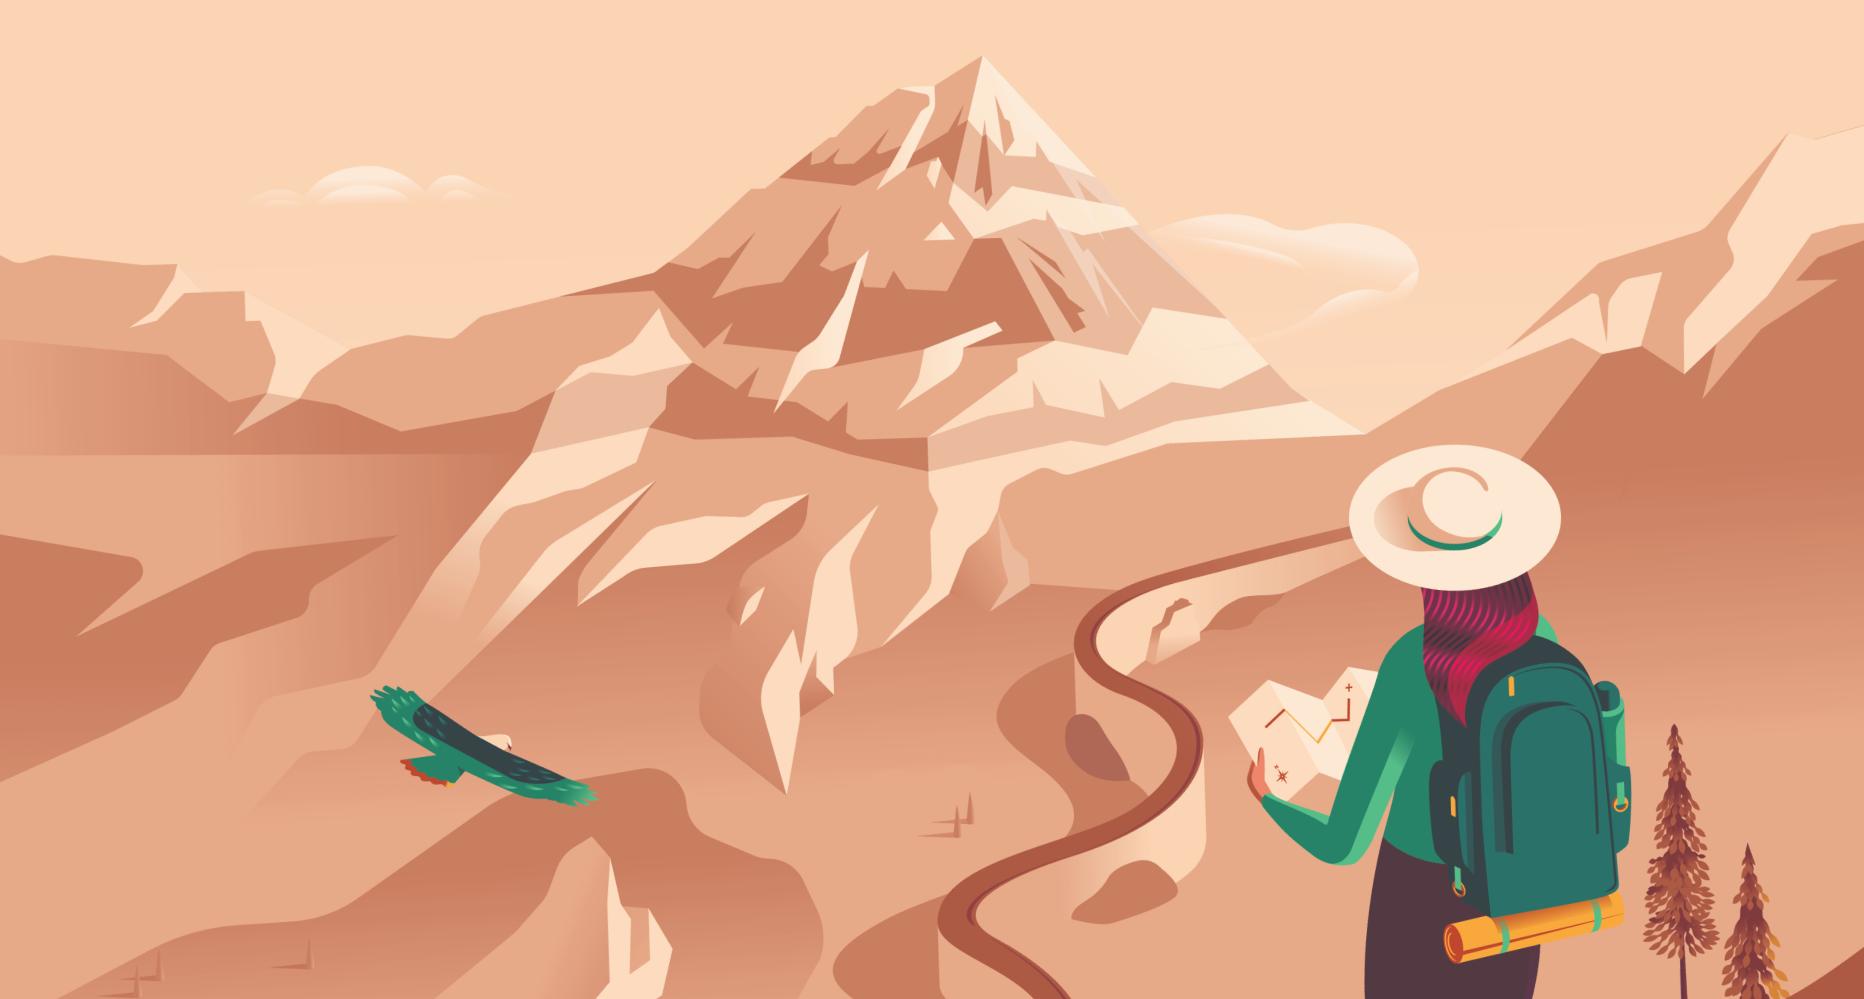 Finding Myself Through Climbing